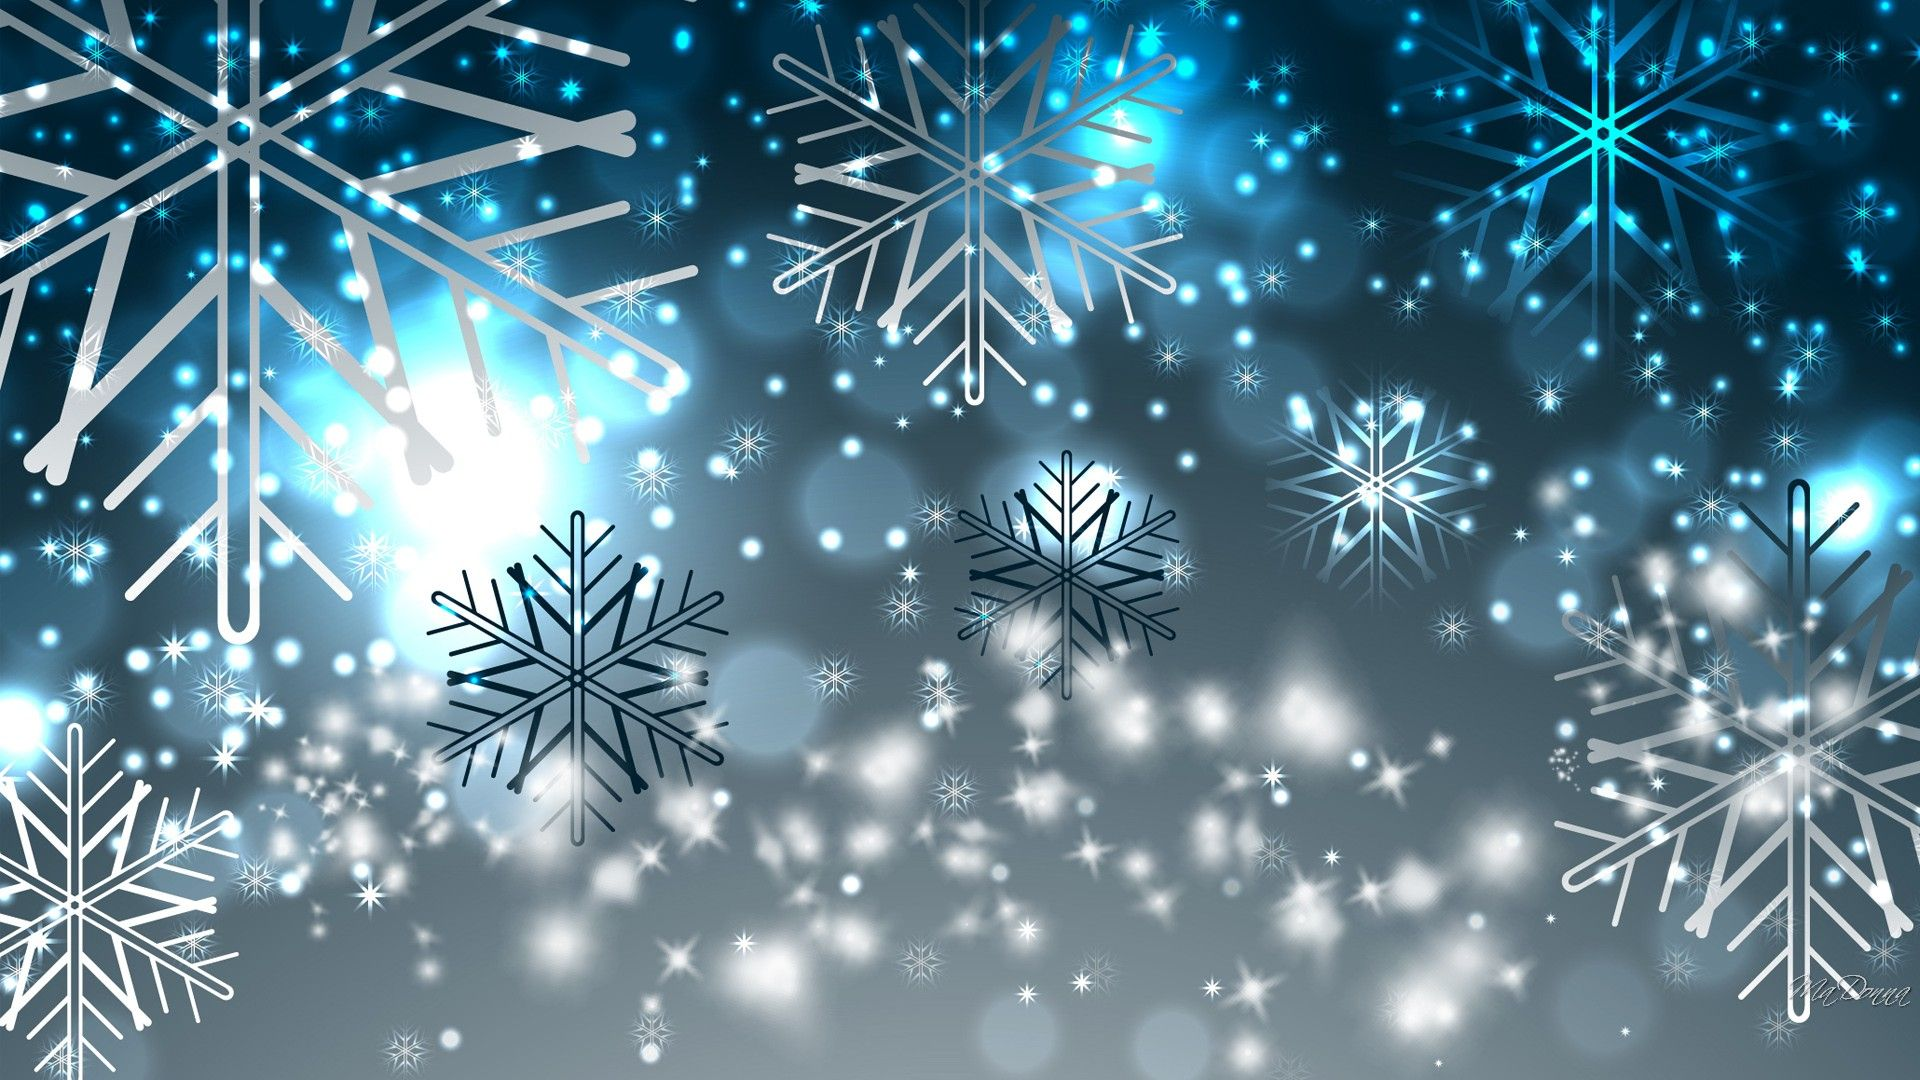 Windows Desktop Images Windows Backgrounds Christmas